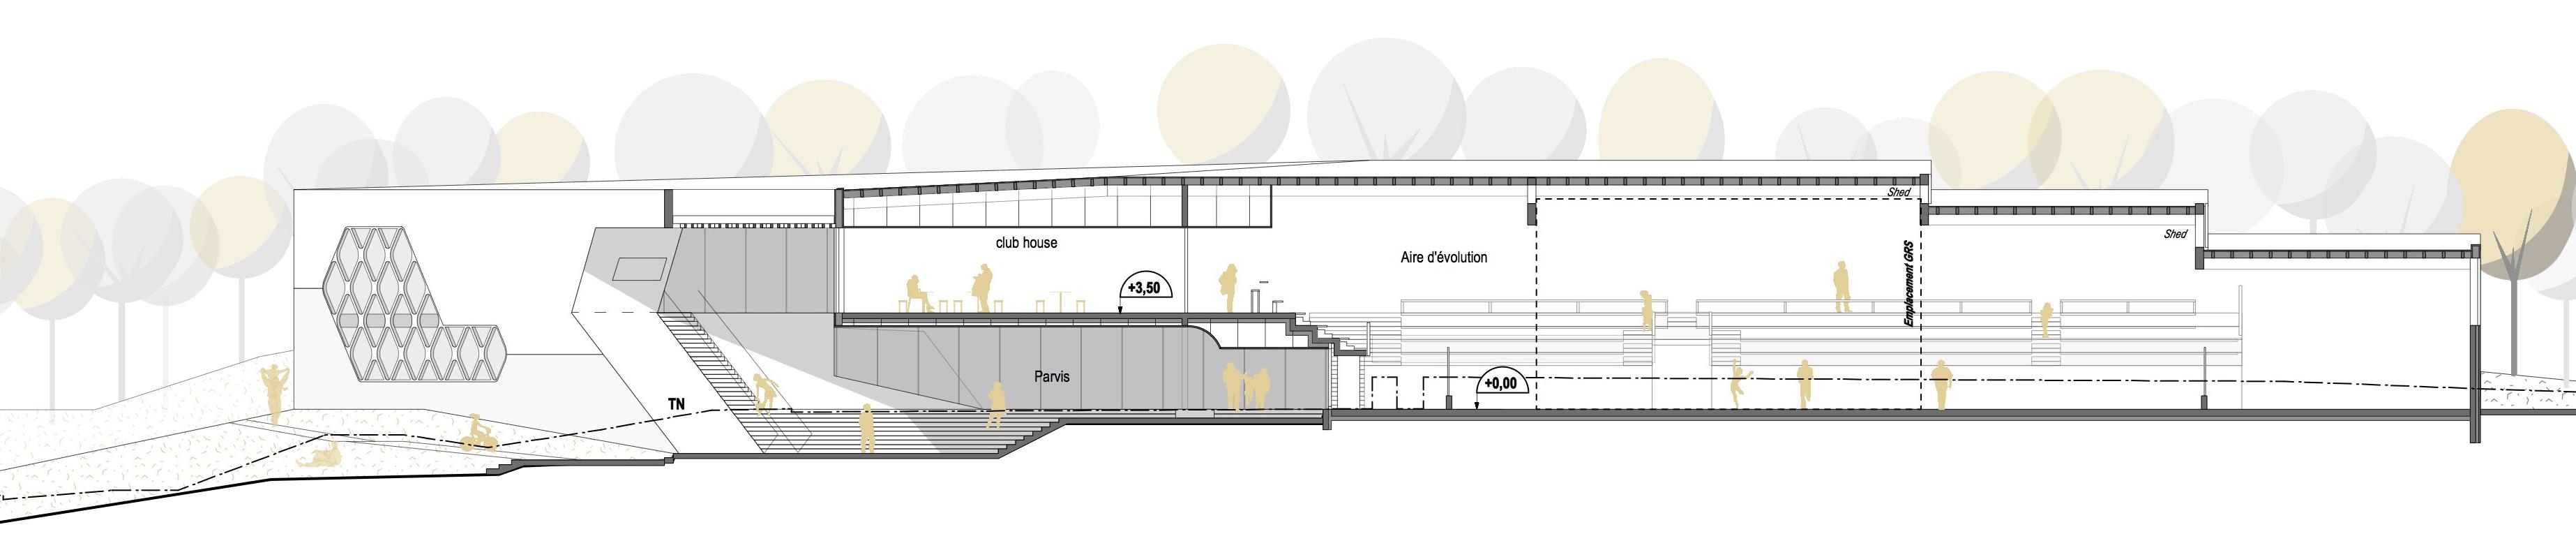 christophe-benichou-architectures-teissier-portal-13